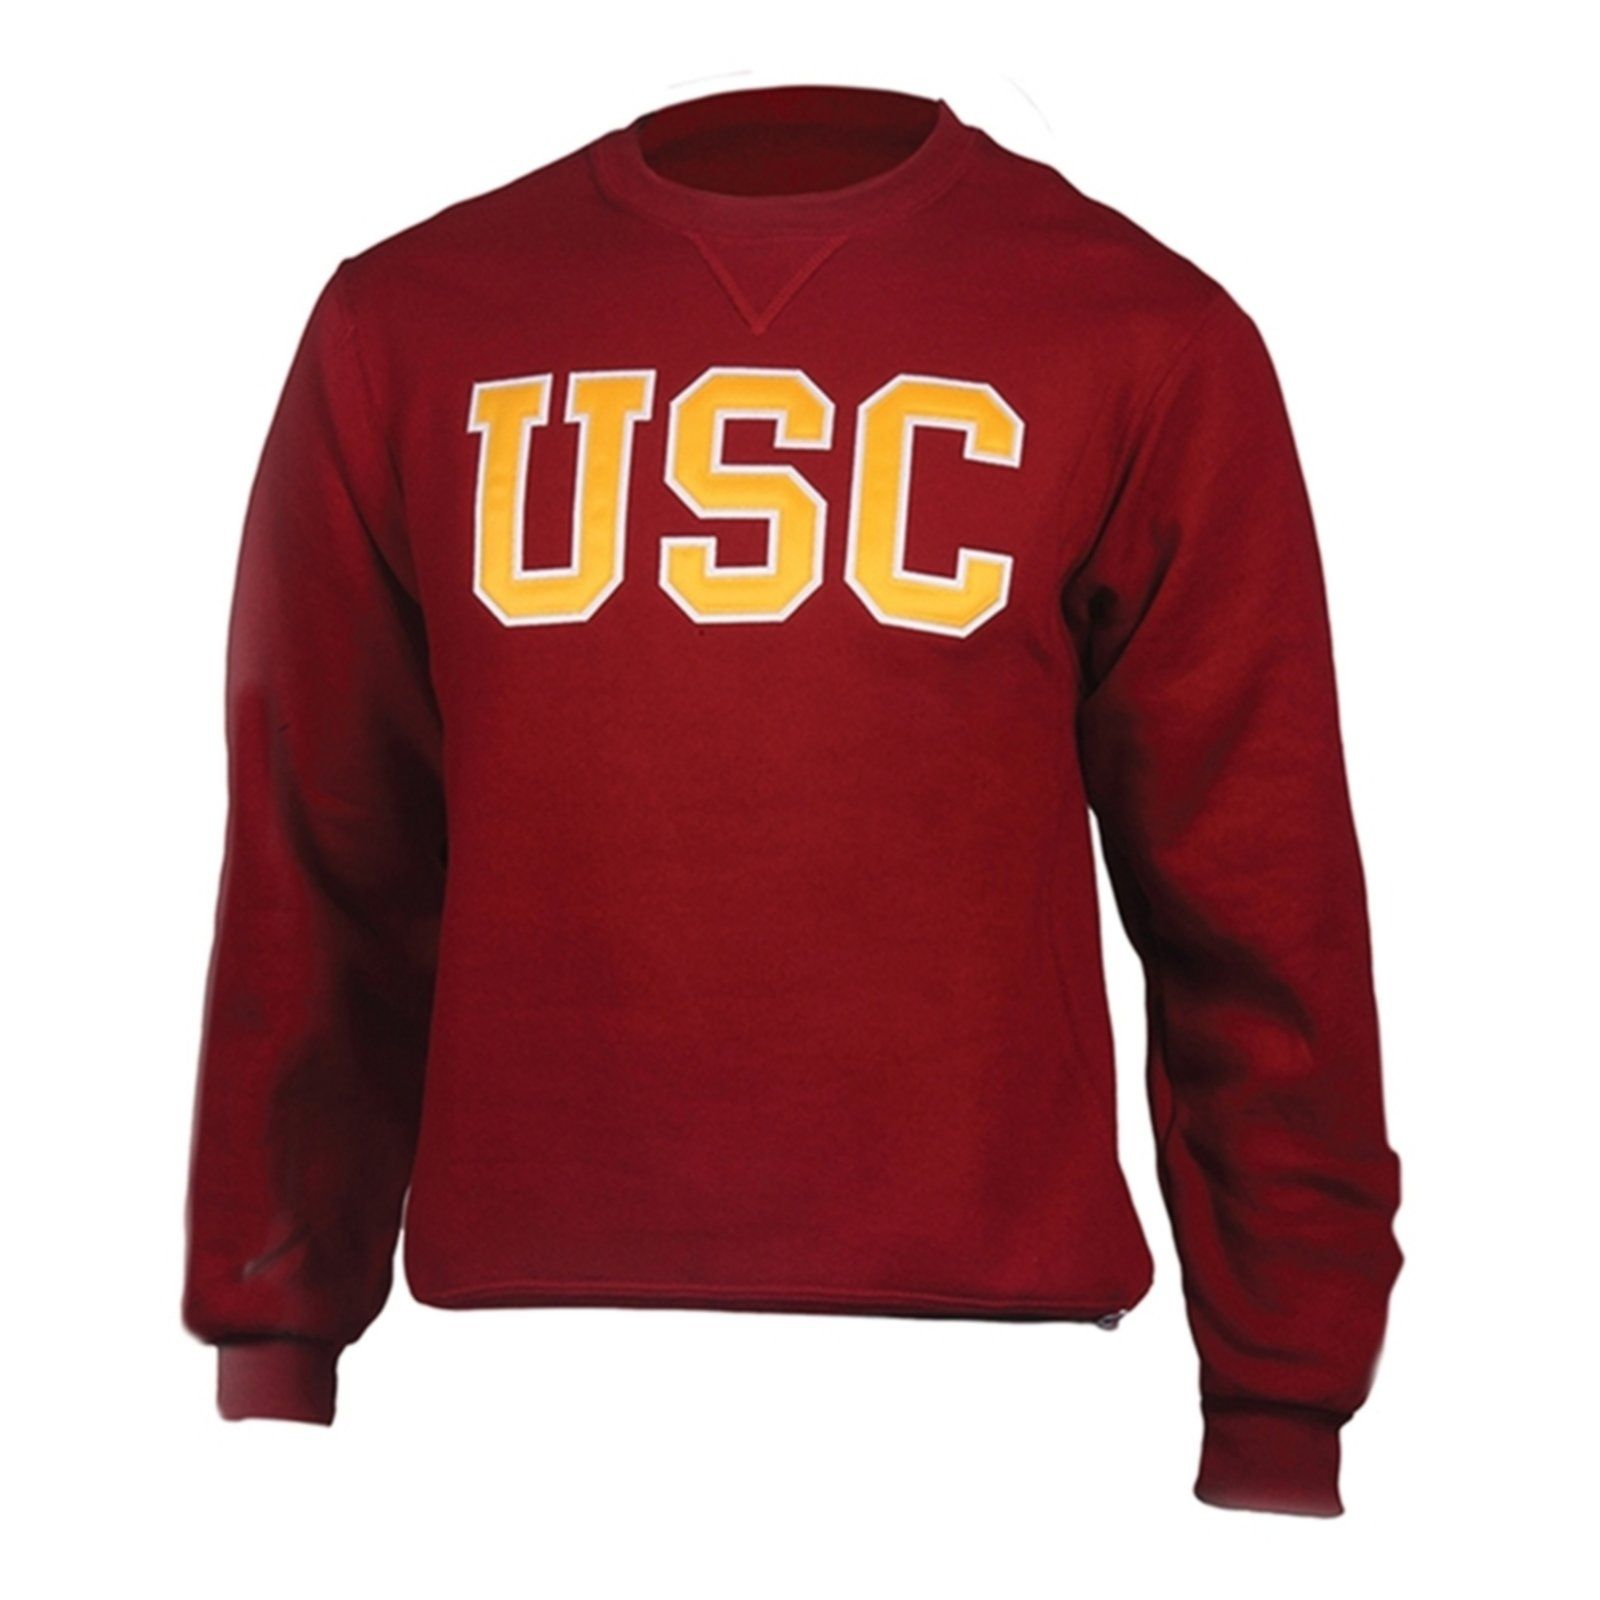 Usc Trojan Basics Heritage Tackle Twill Fleece Sweatshirt Sweatshirts Usc Sweatshirt Sweatshirt Fleece